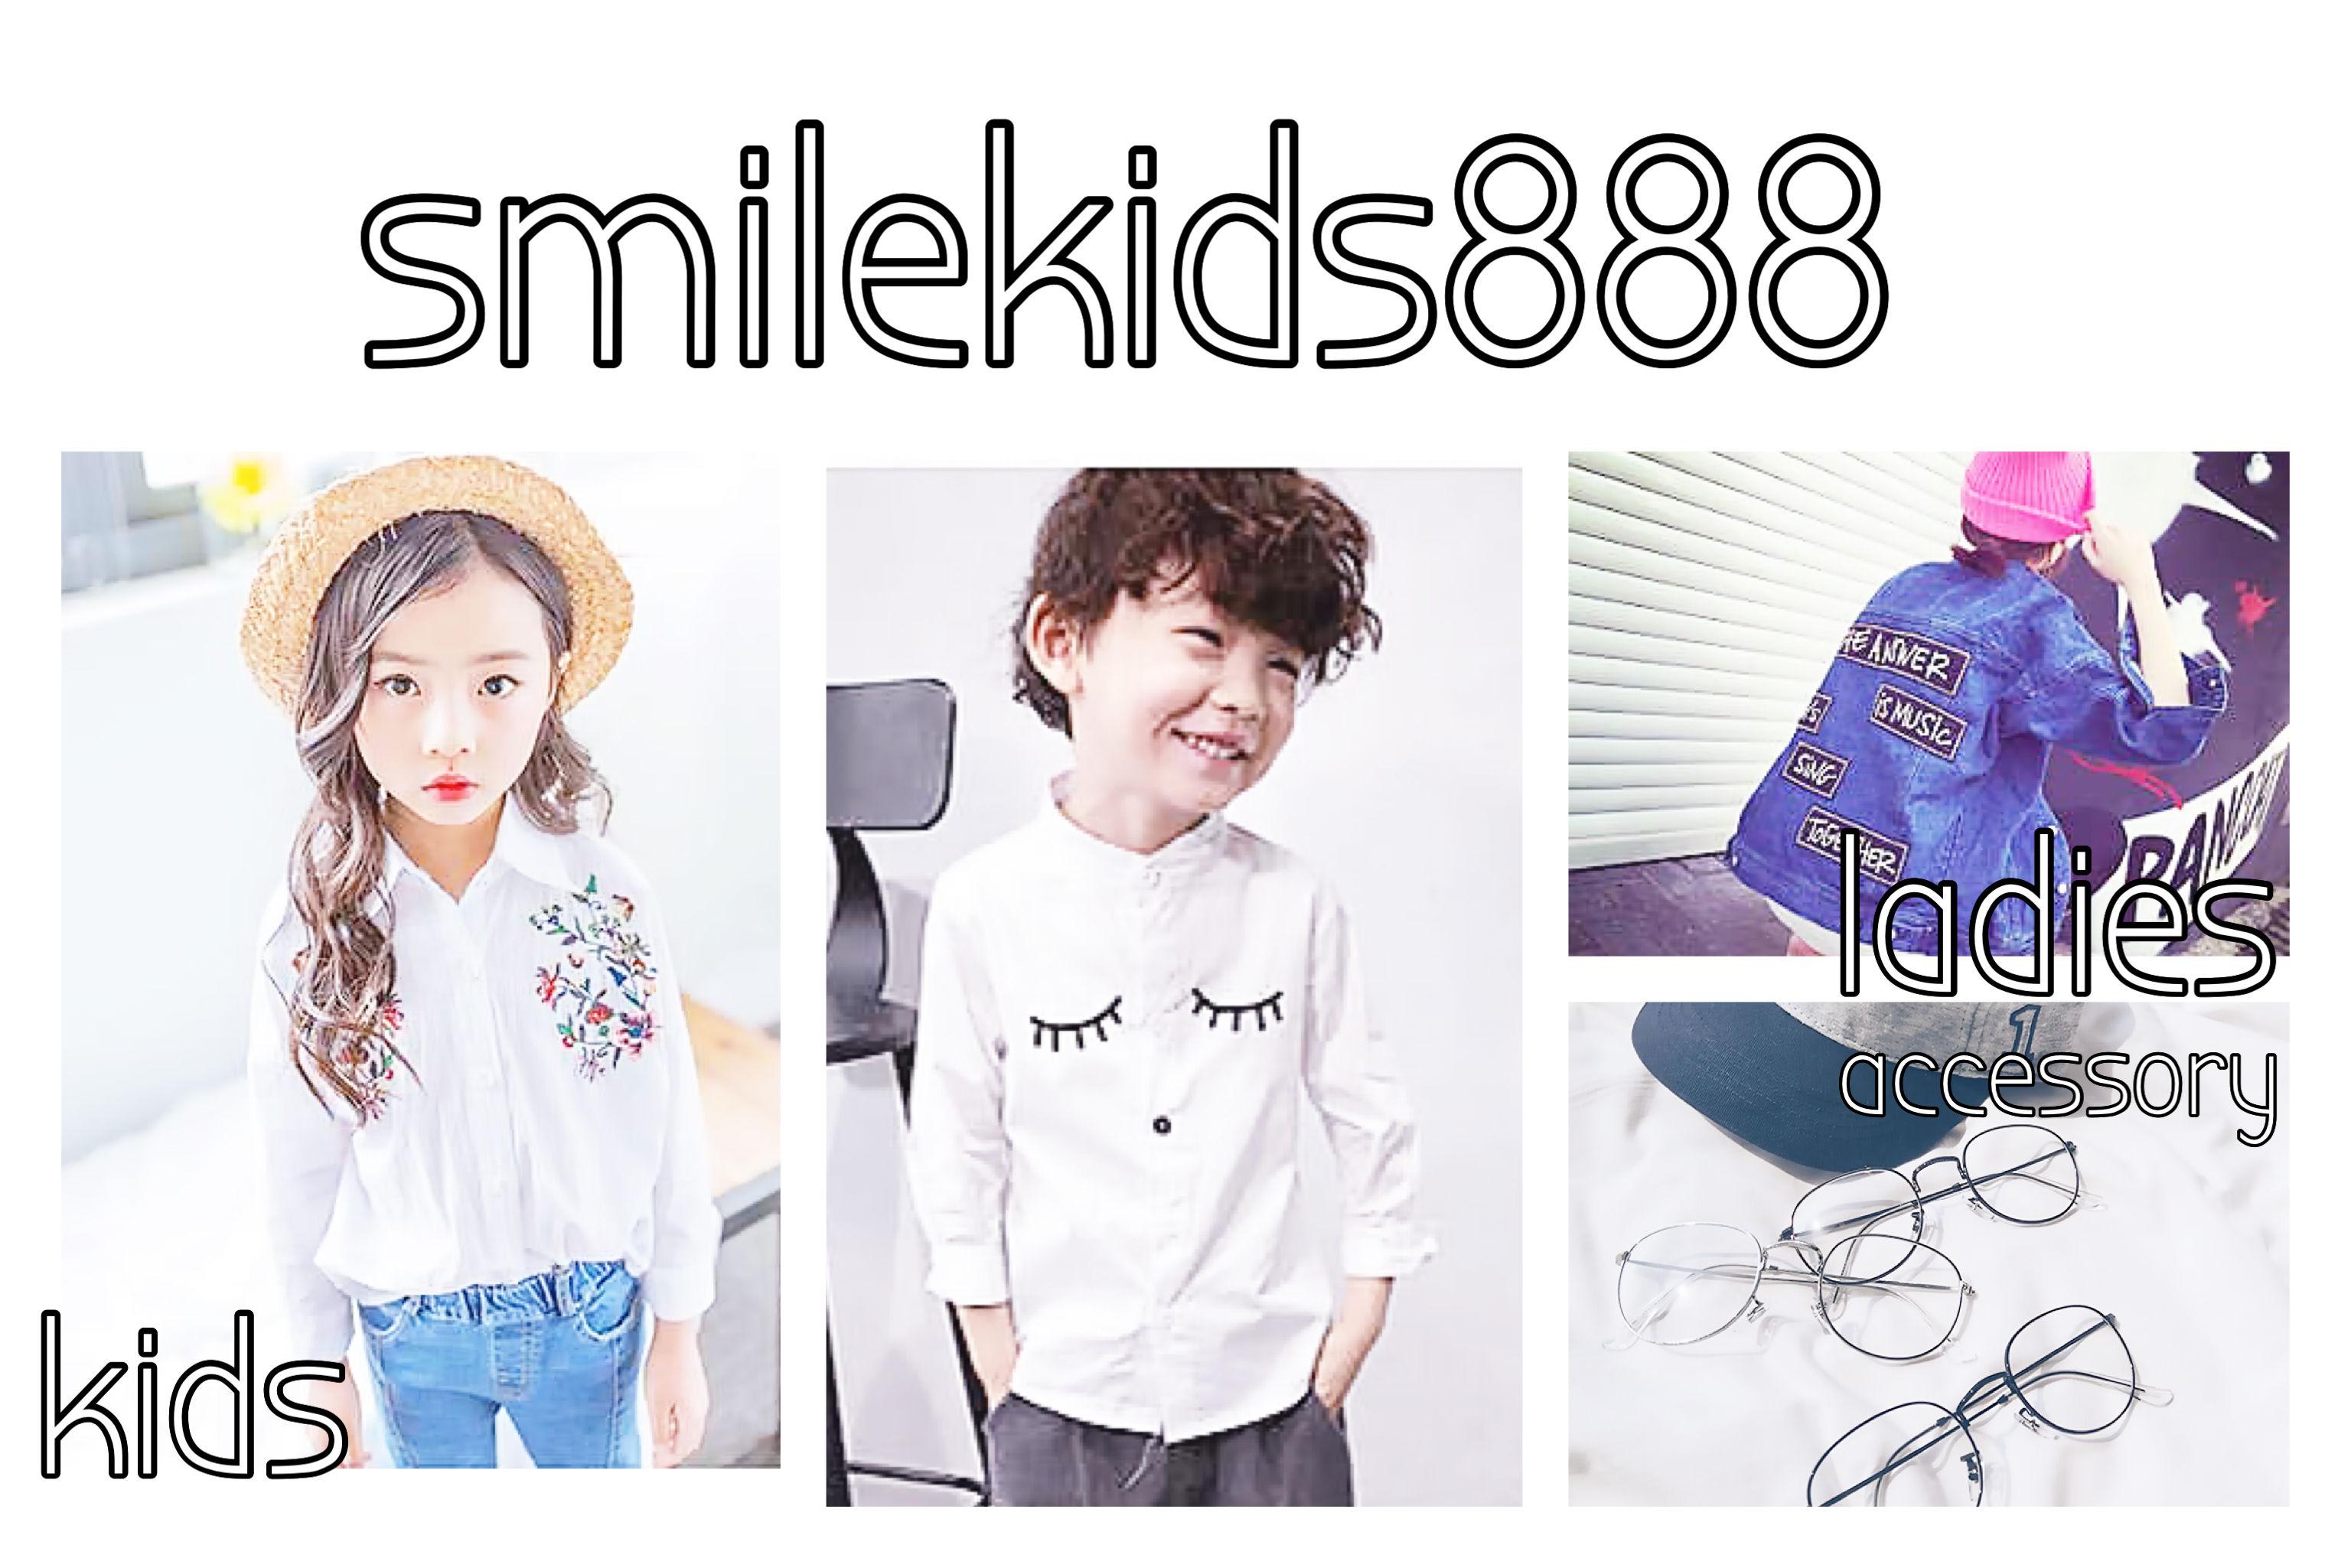 smilekids888